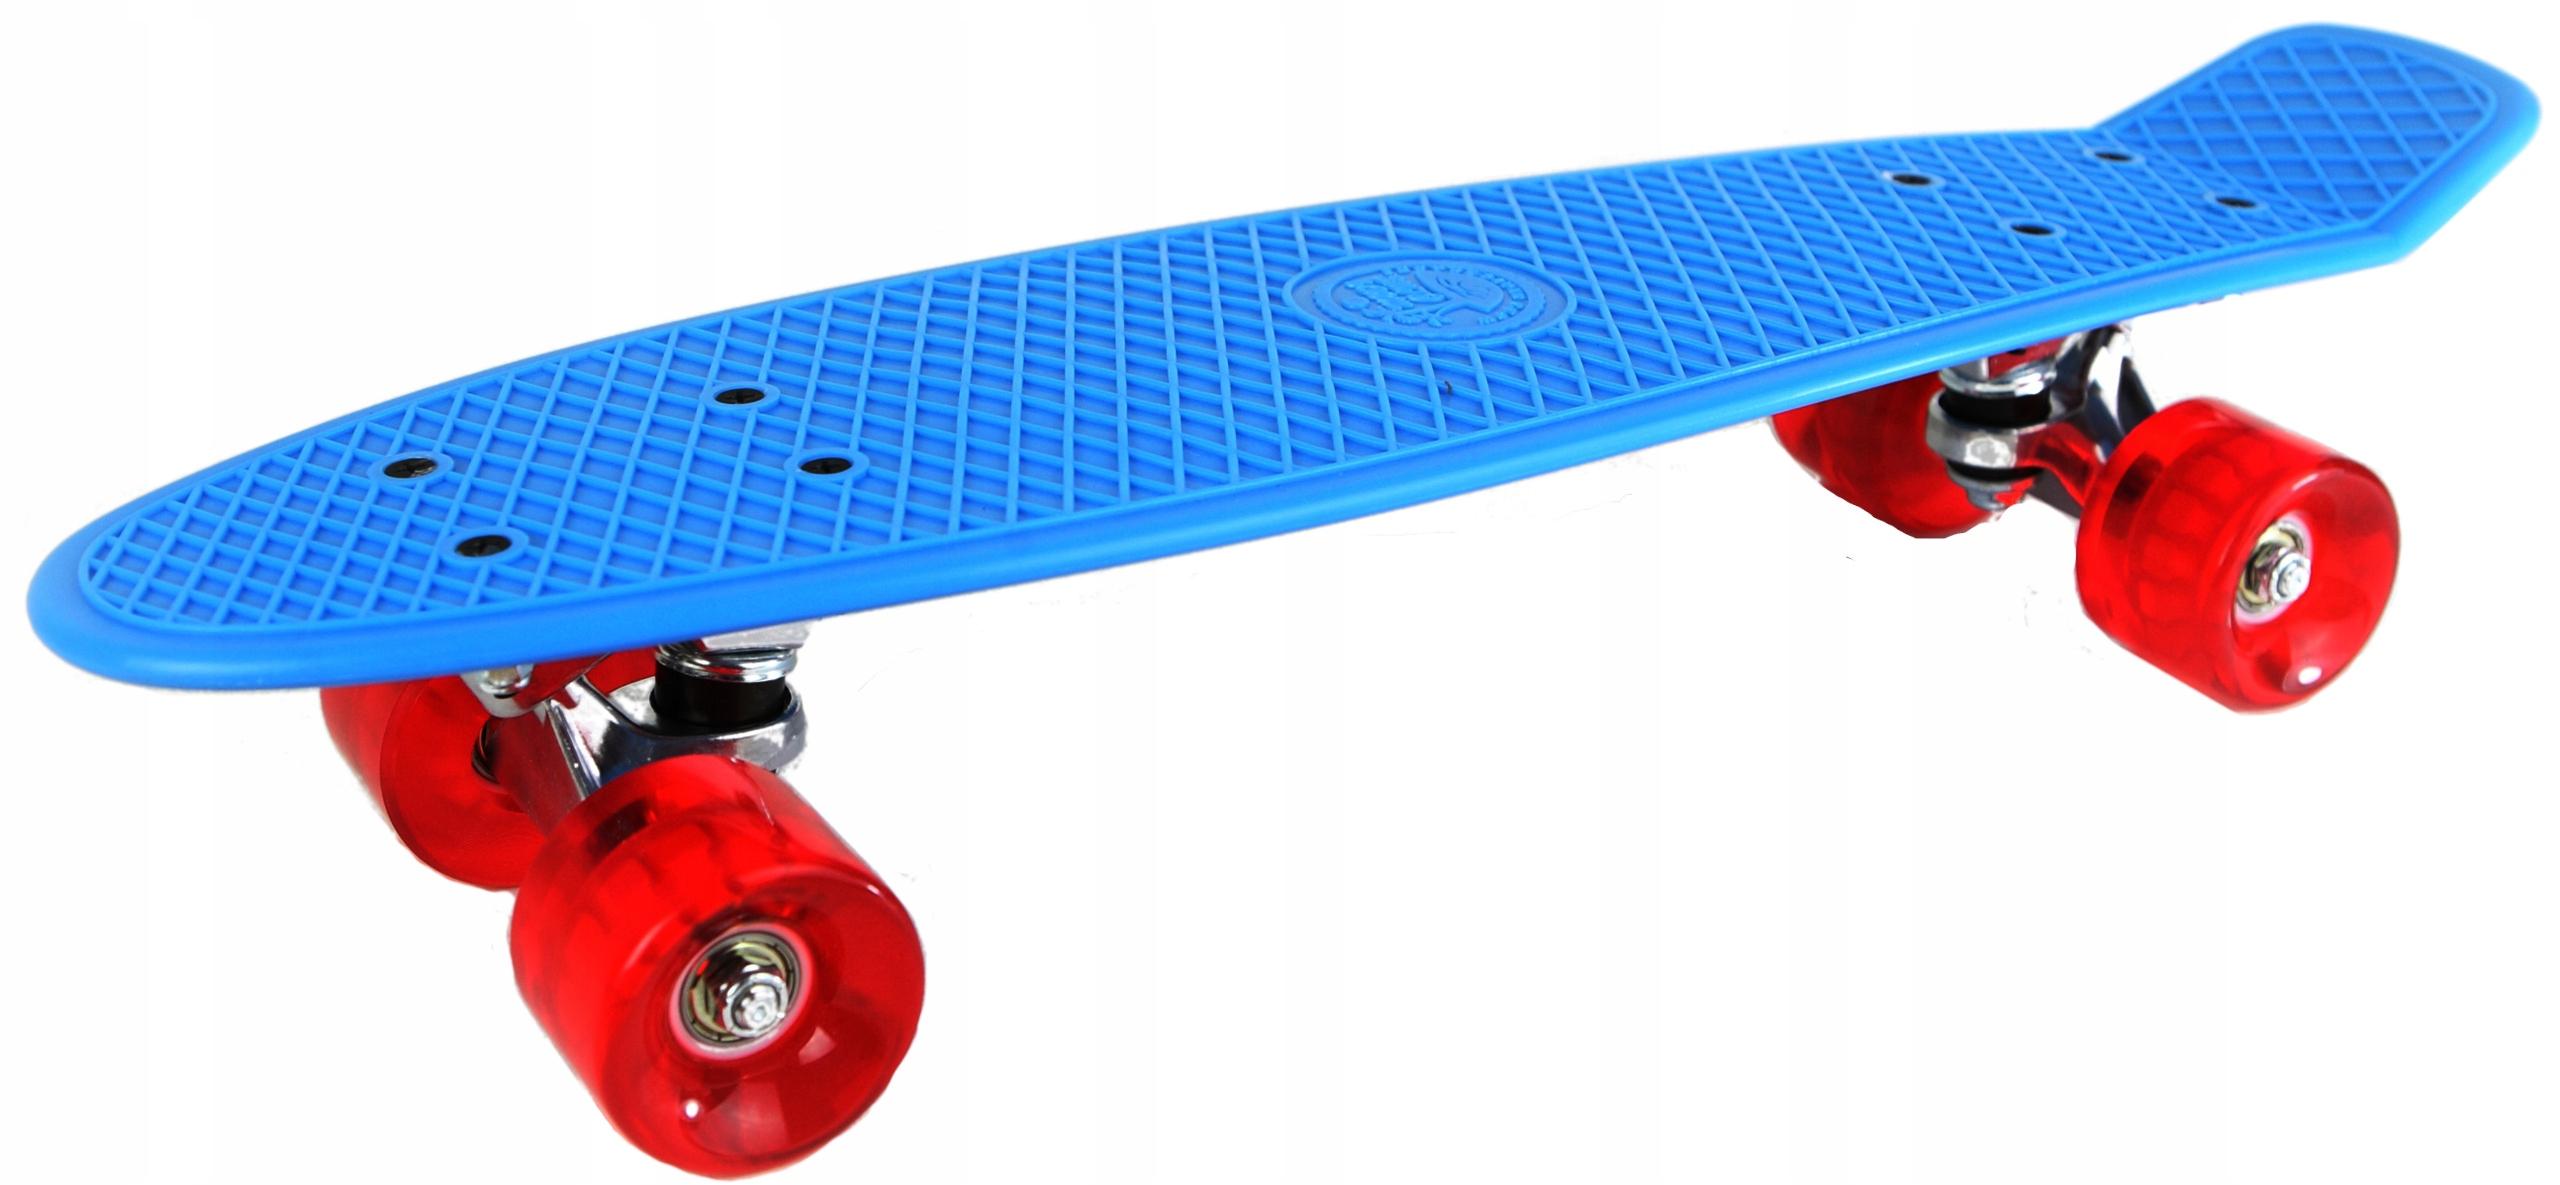 Modrý a červený skateboard PROMO